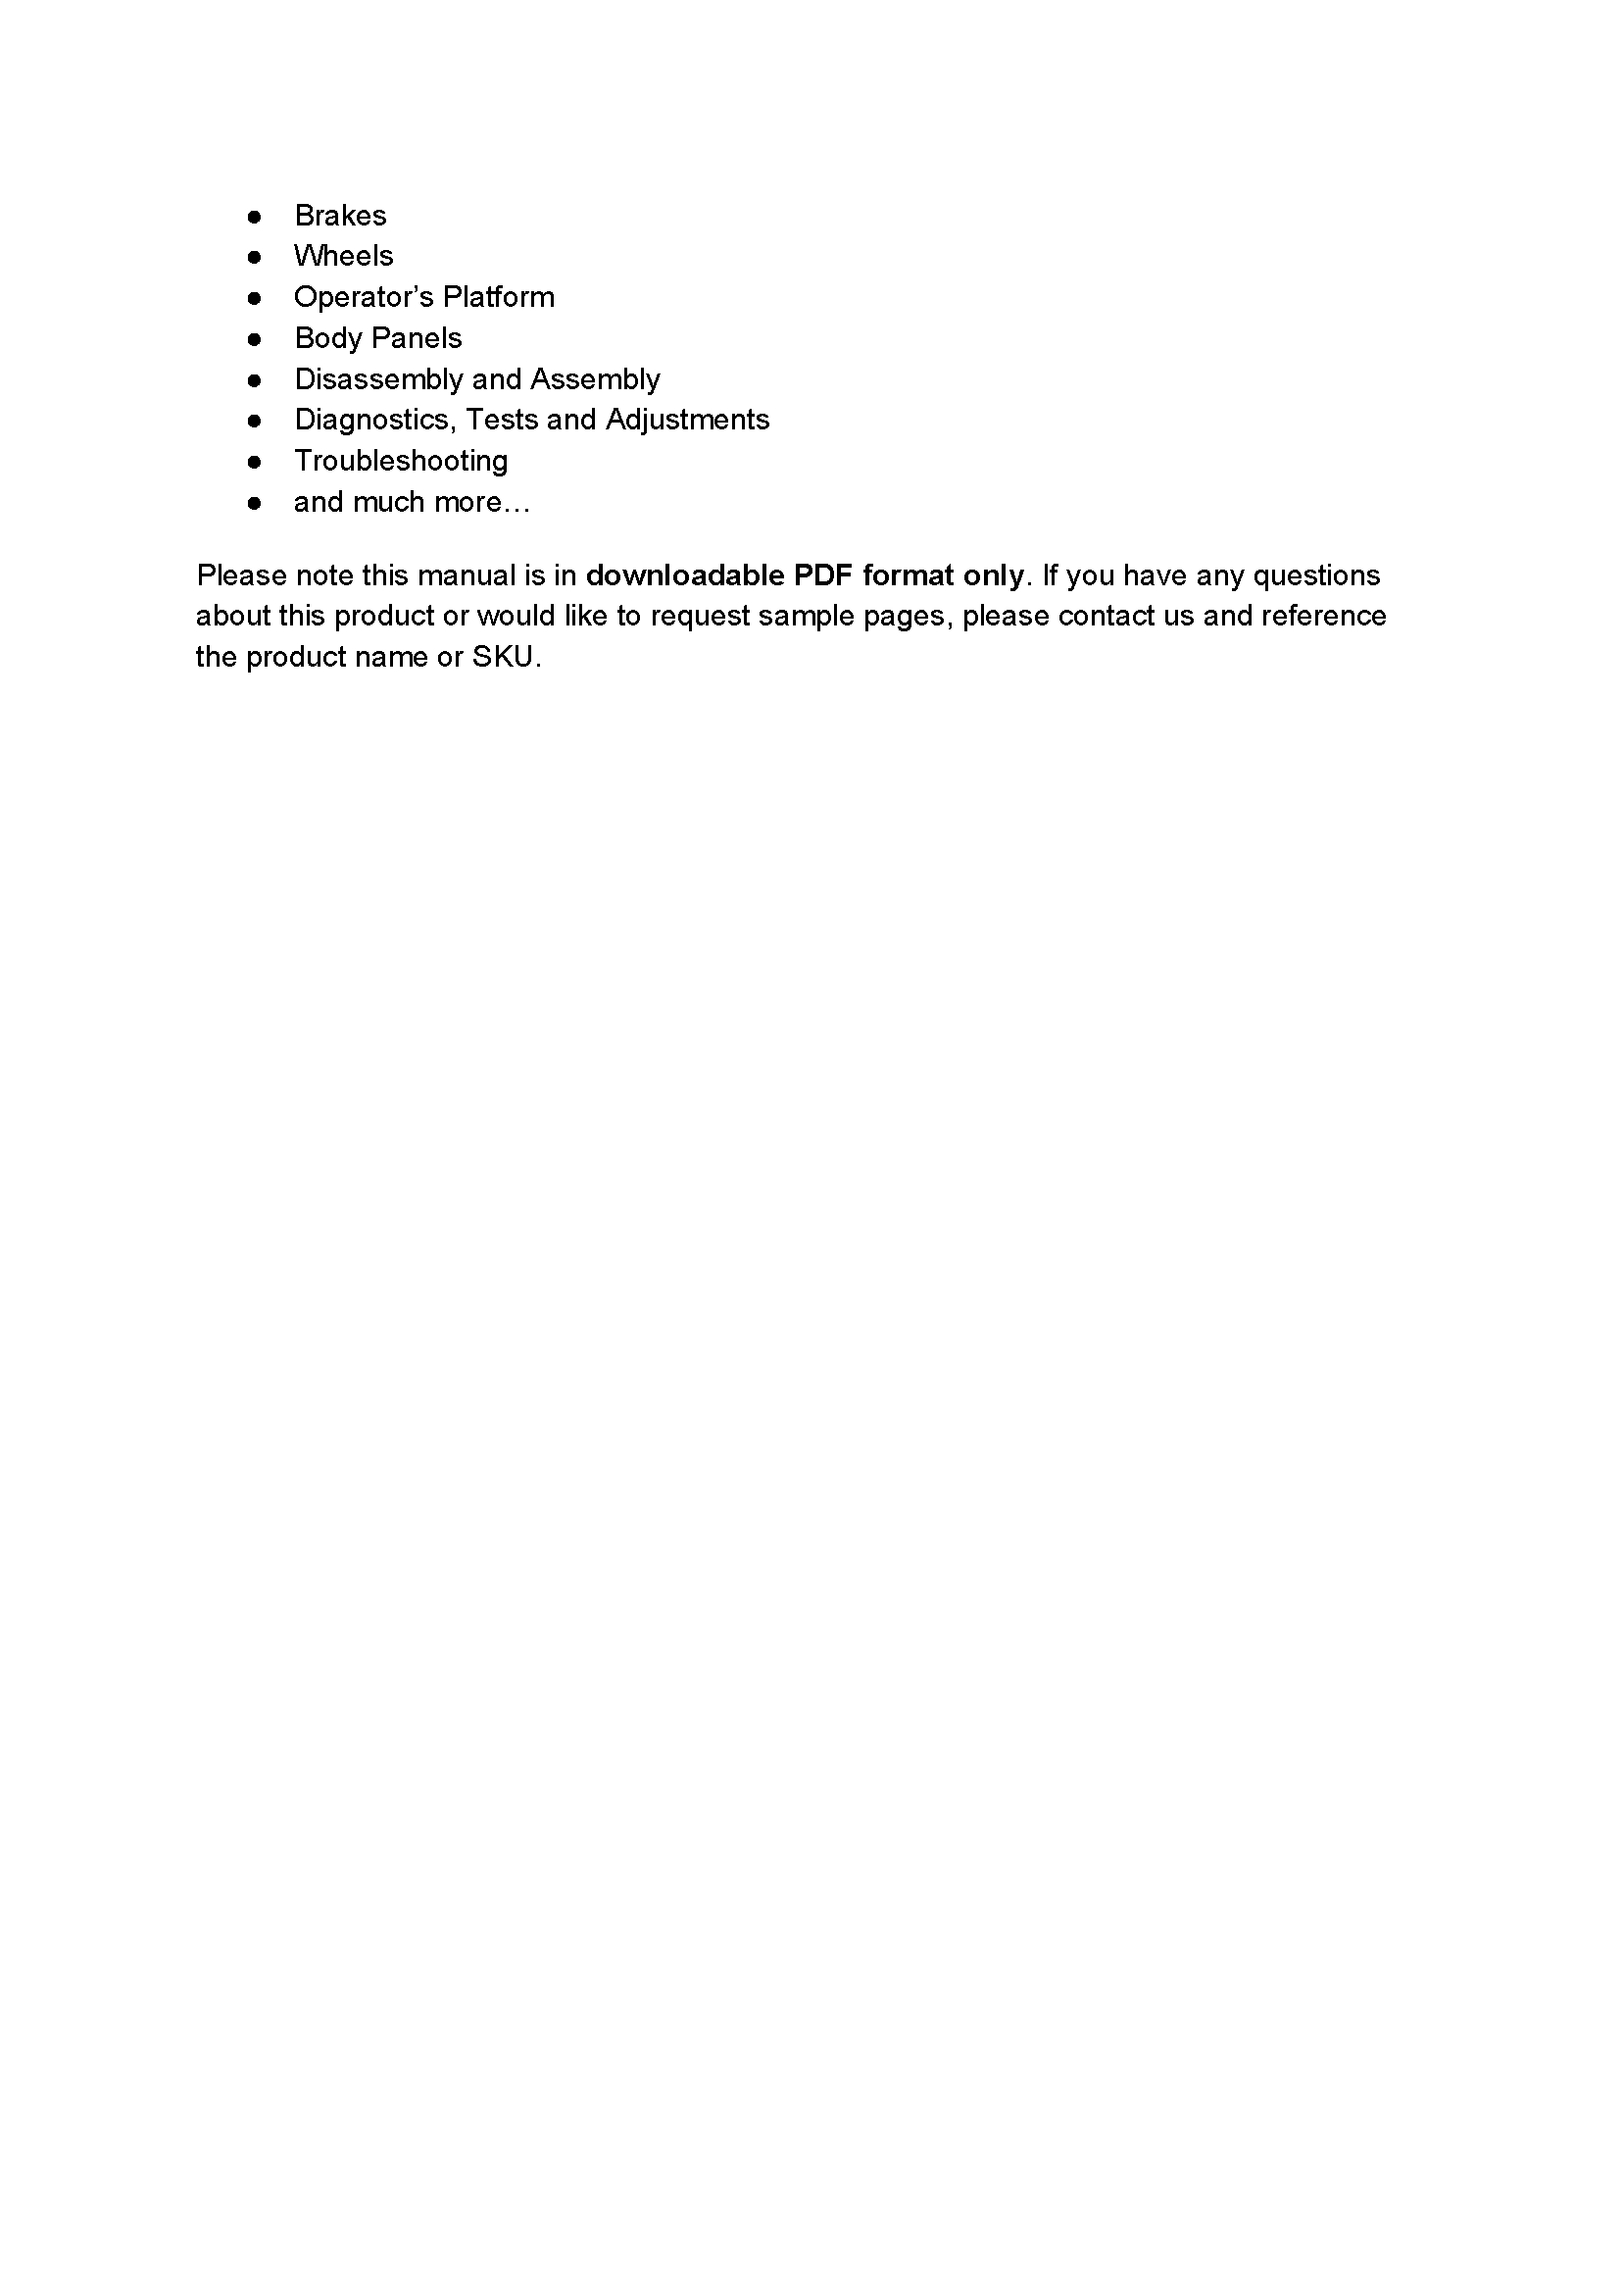 John Deere 8320T manual